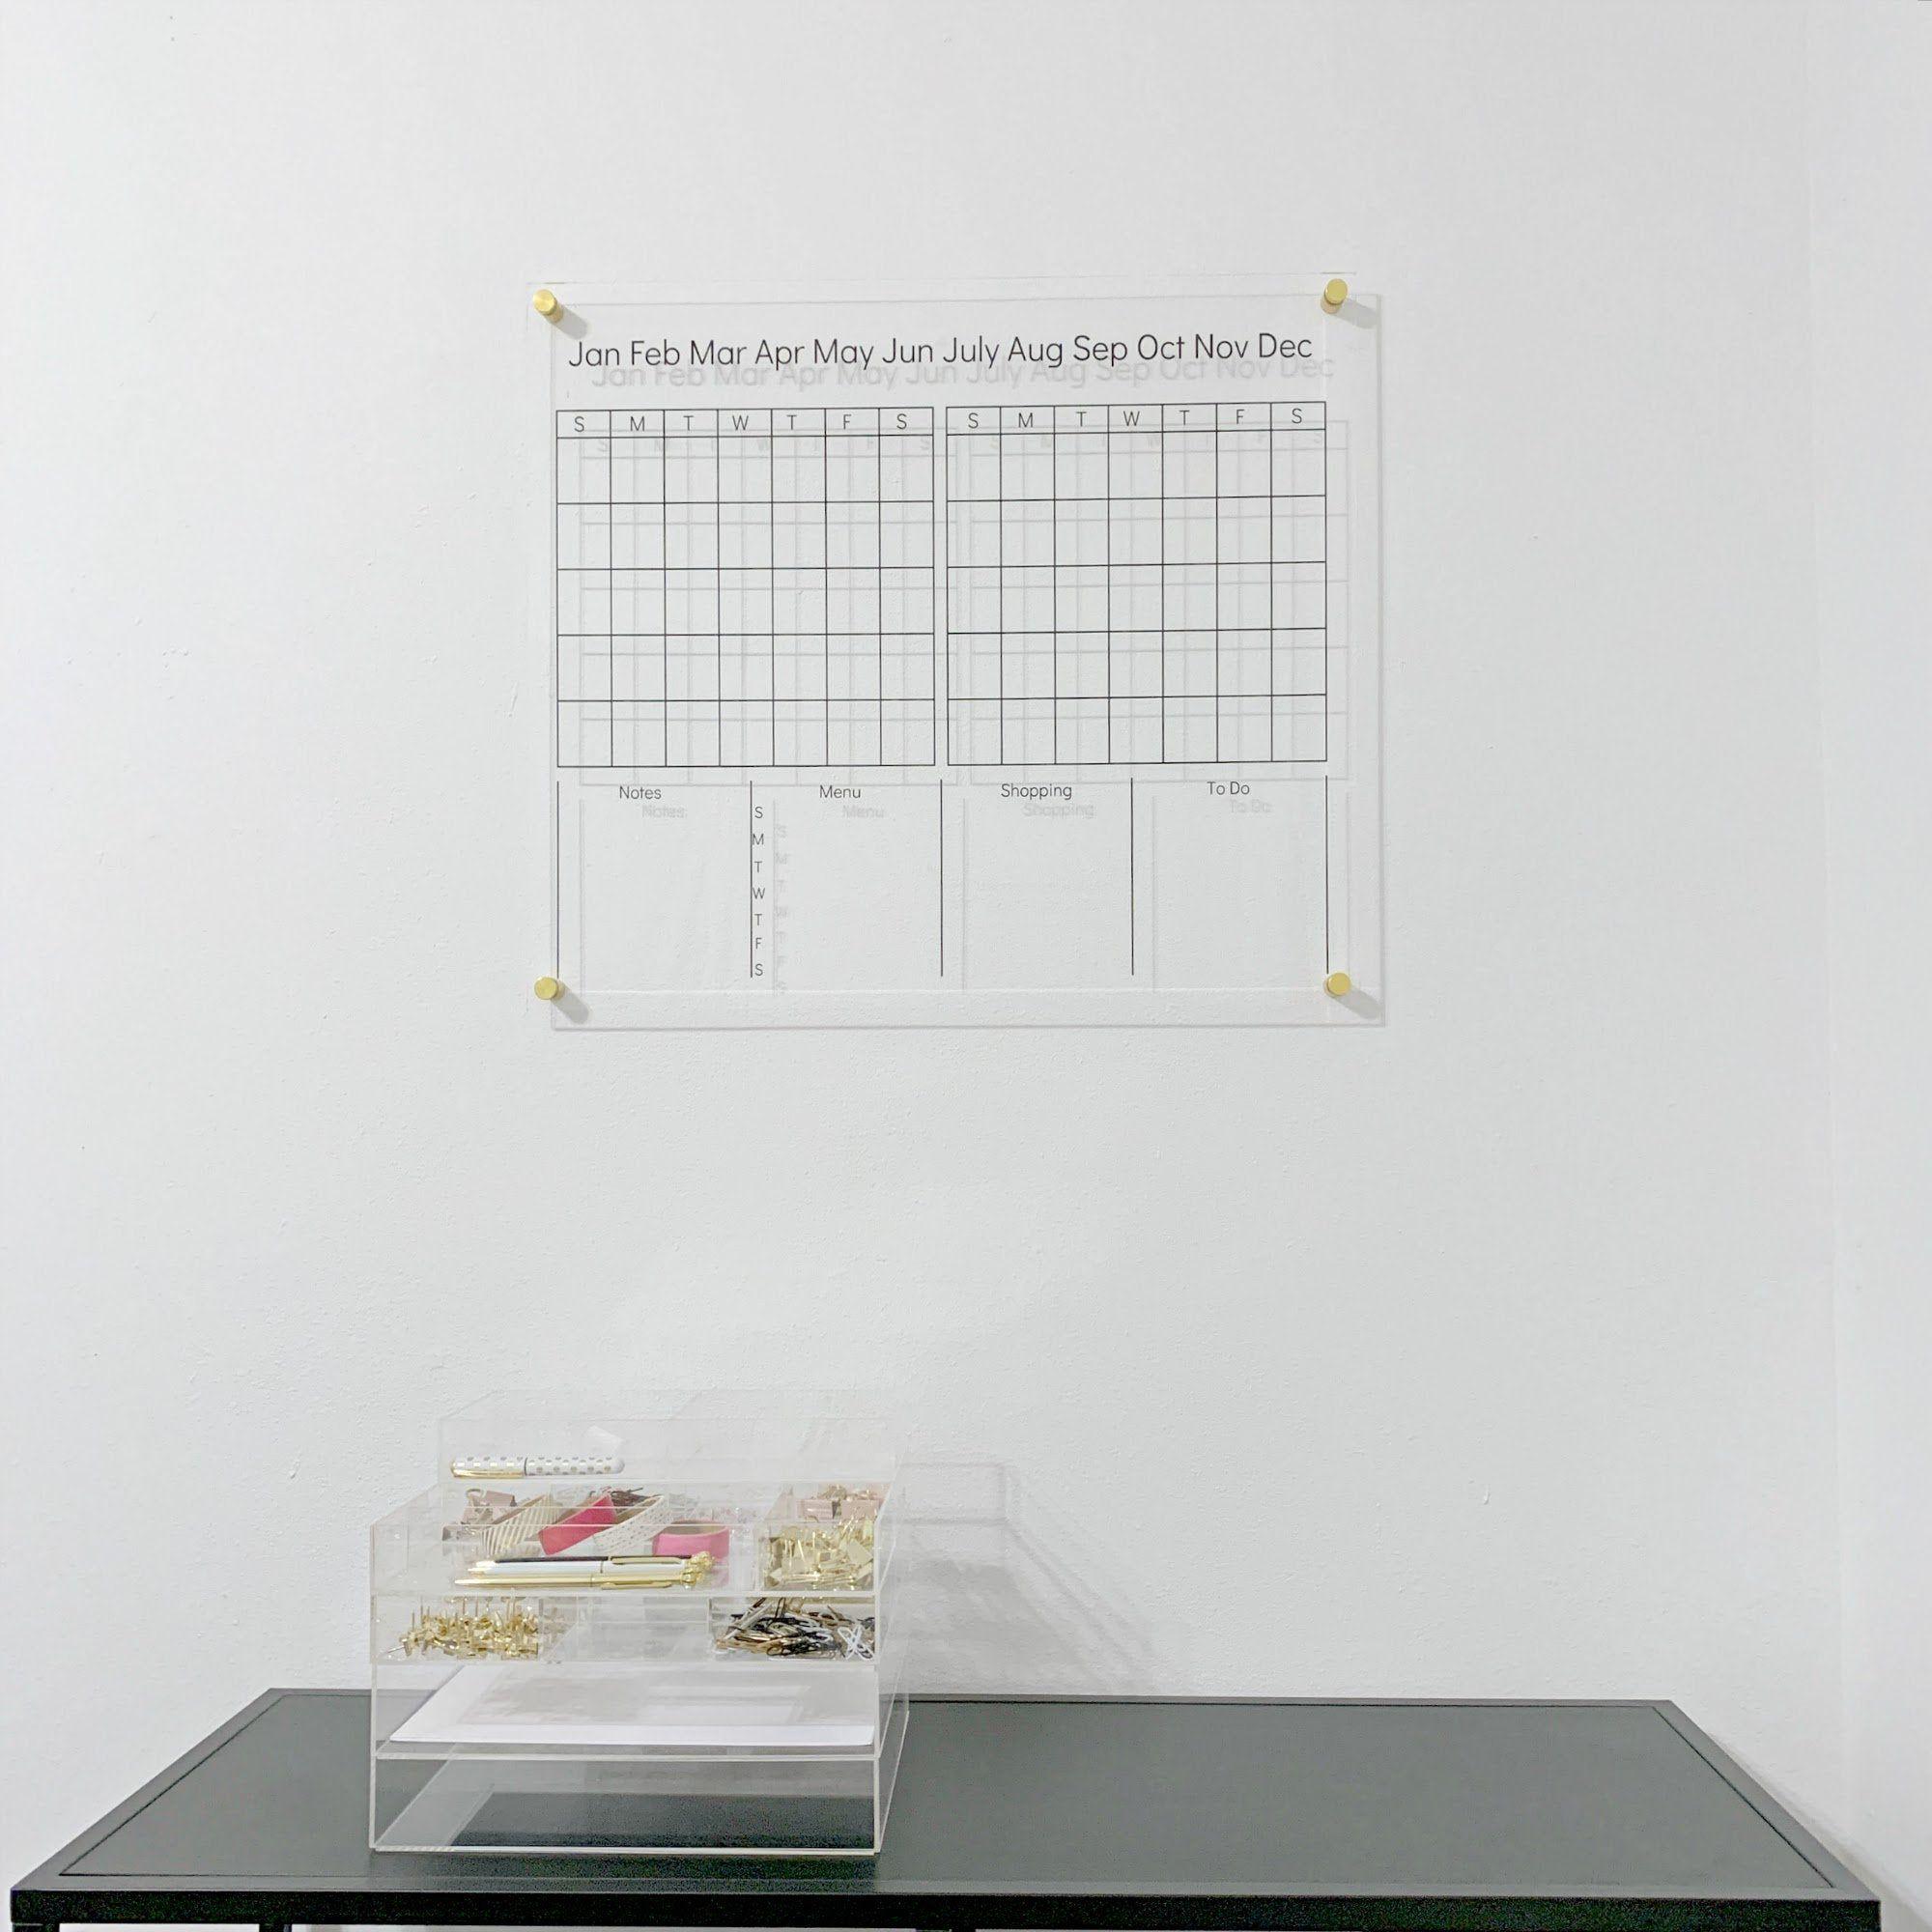 Acrylic Dry Erase Calendar Board, Family Wall Command